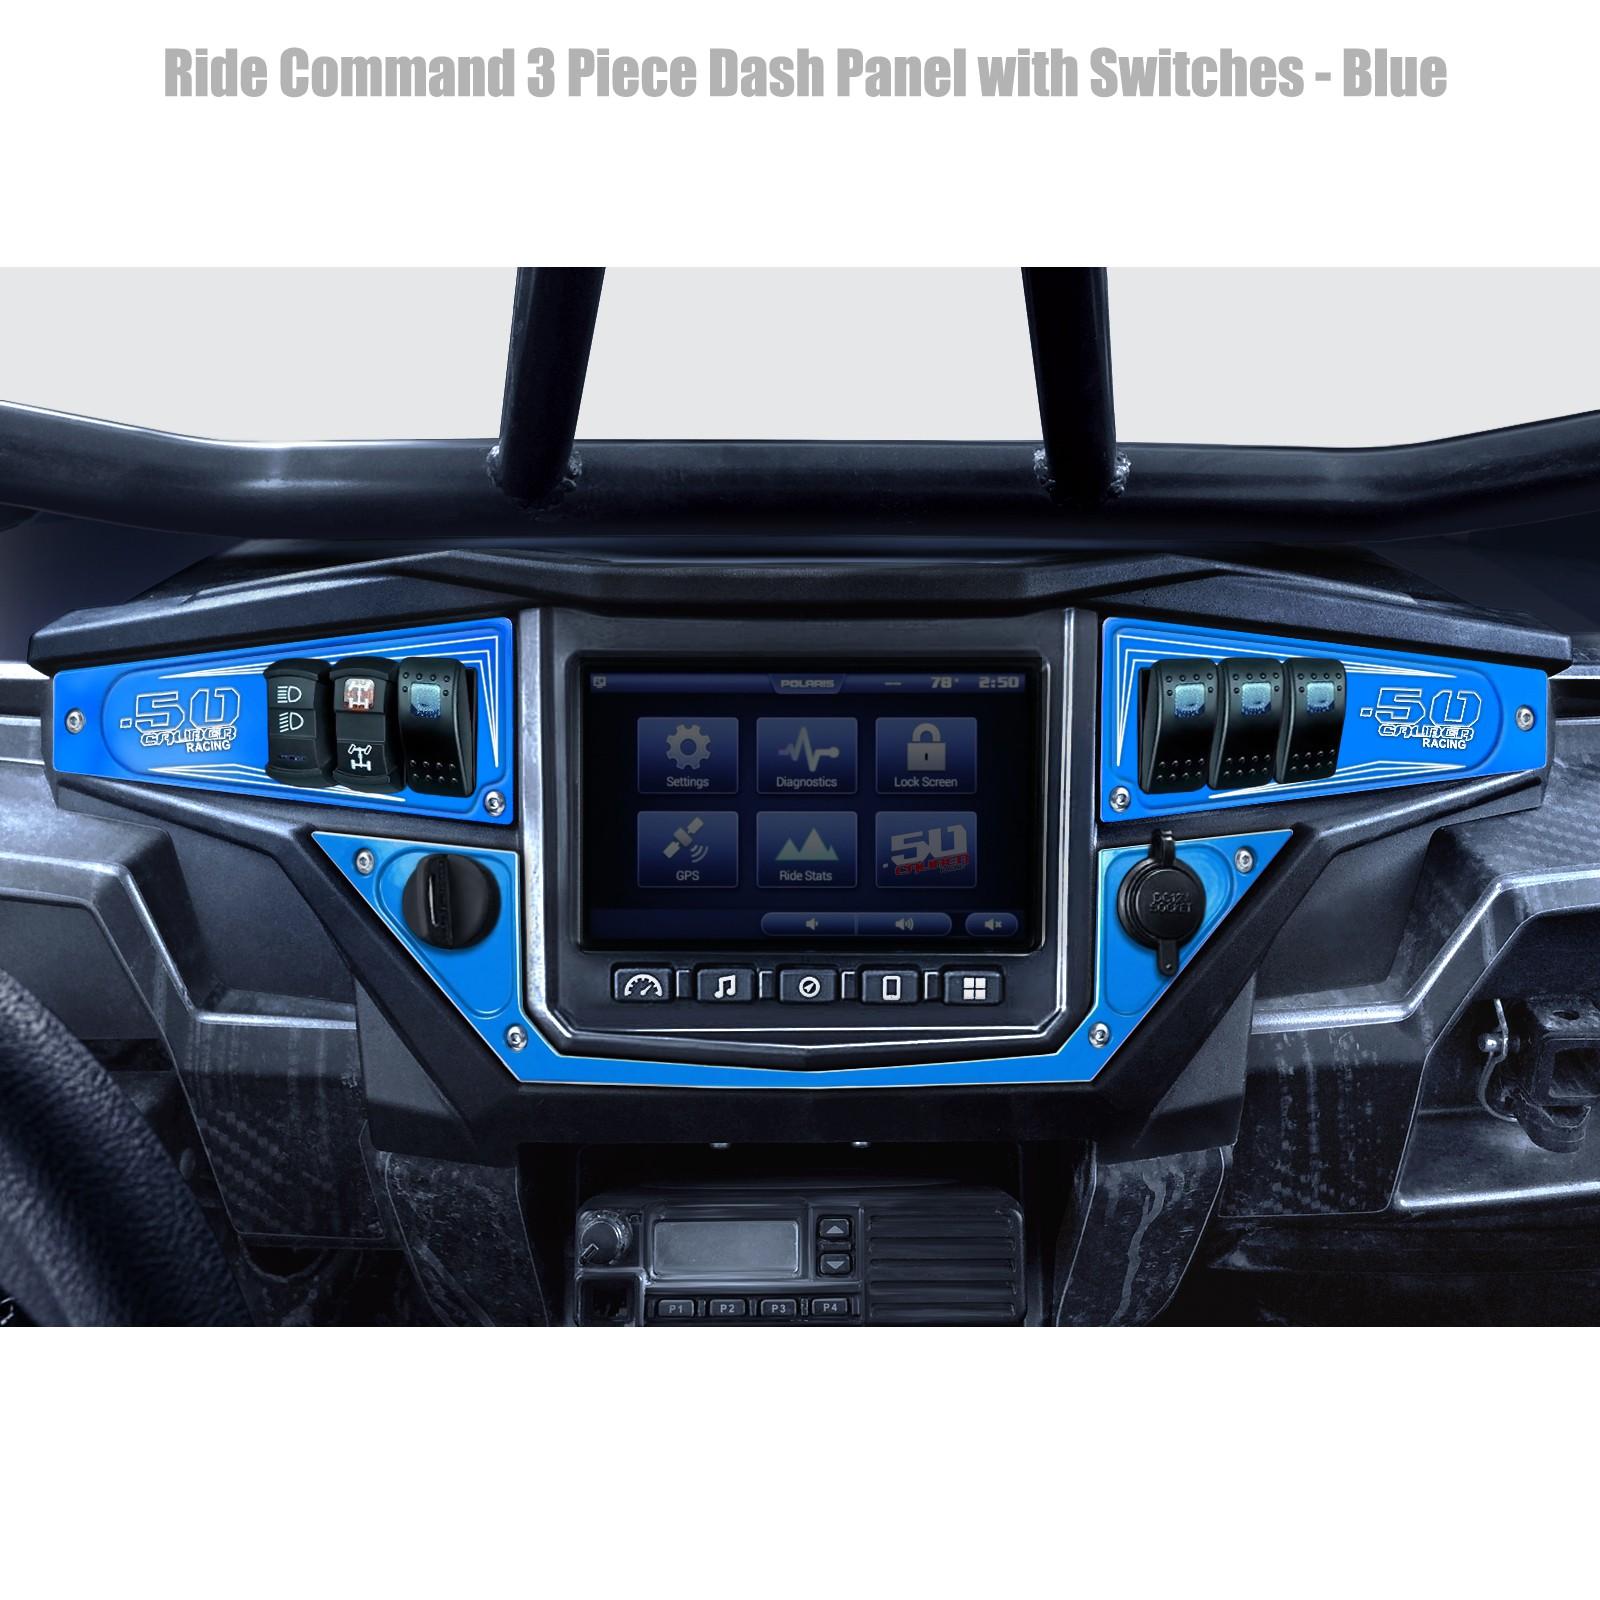 2017 Polaris RZR XP 1000 Turbo Blue Dash Switch Panel